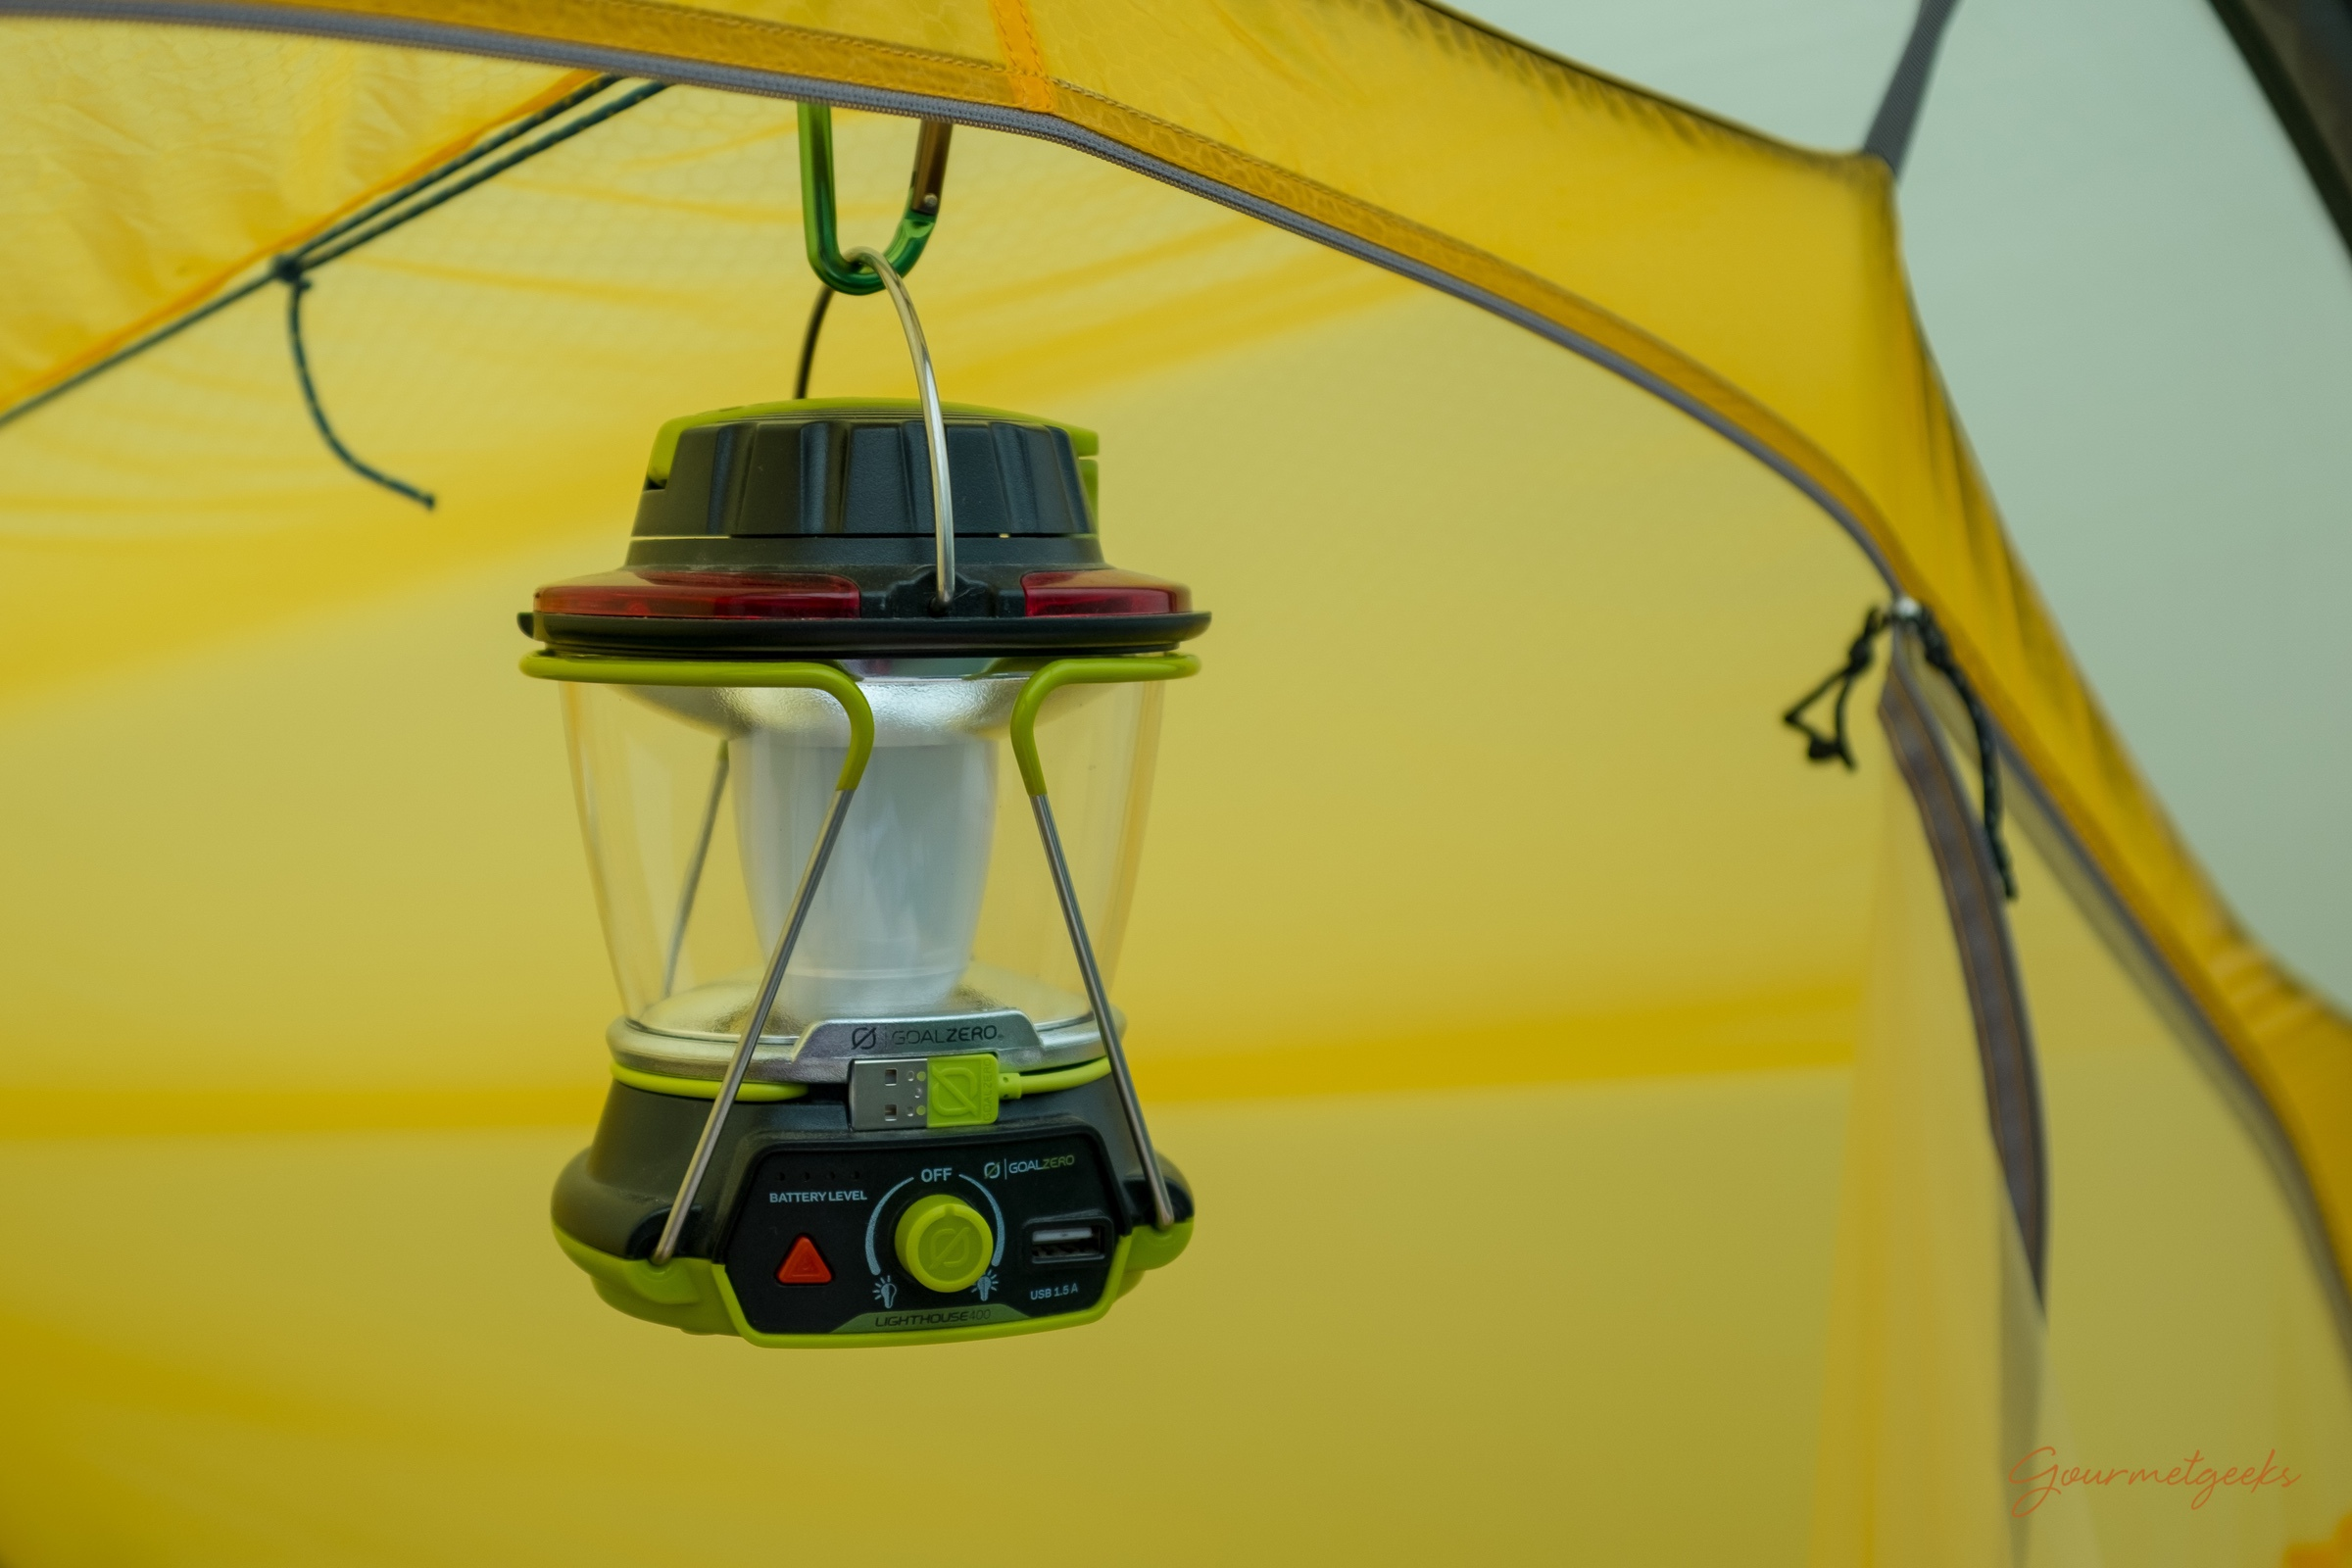 Zeltlampe mit Powerbank :-)